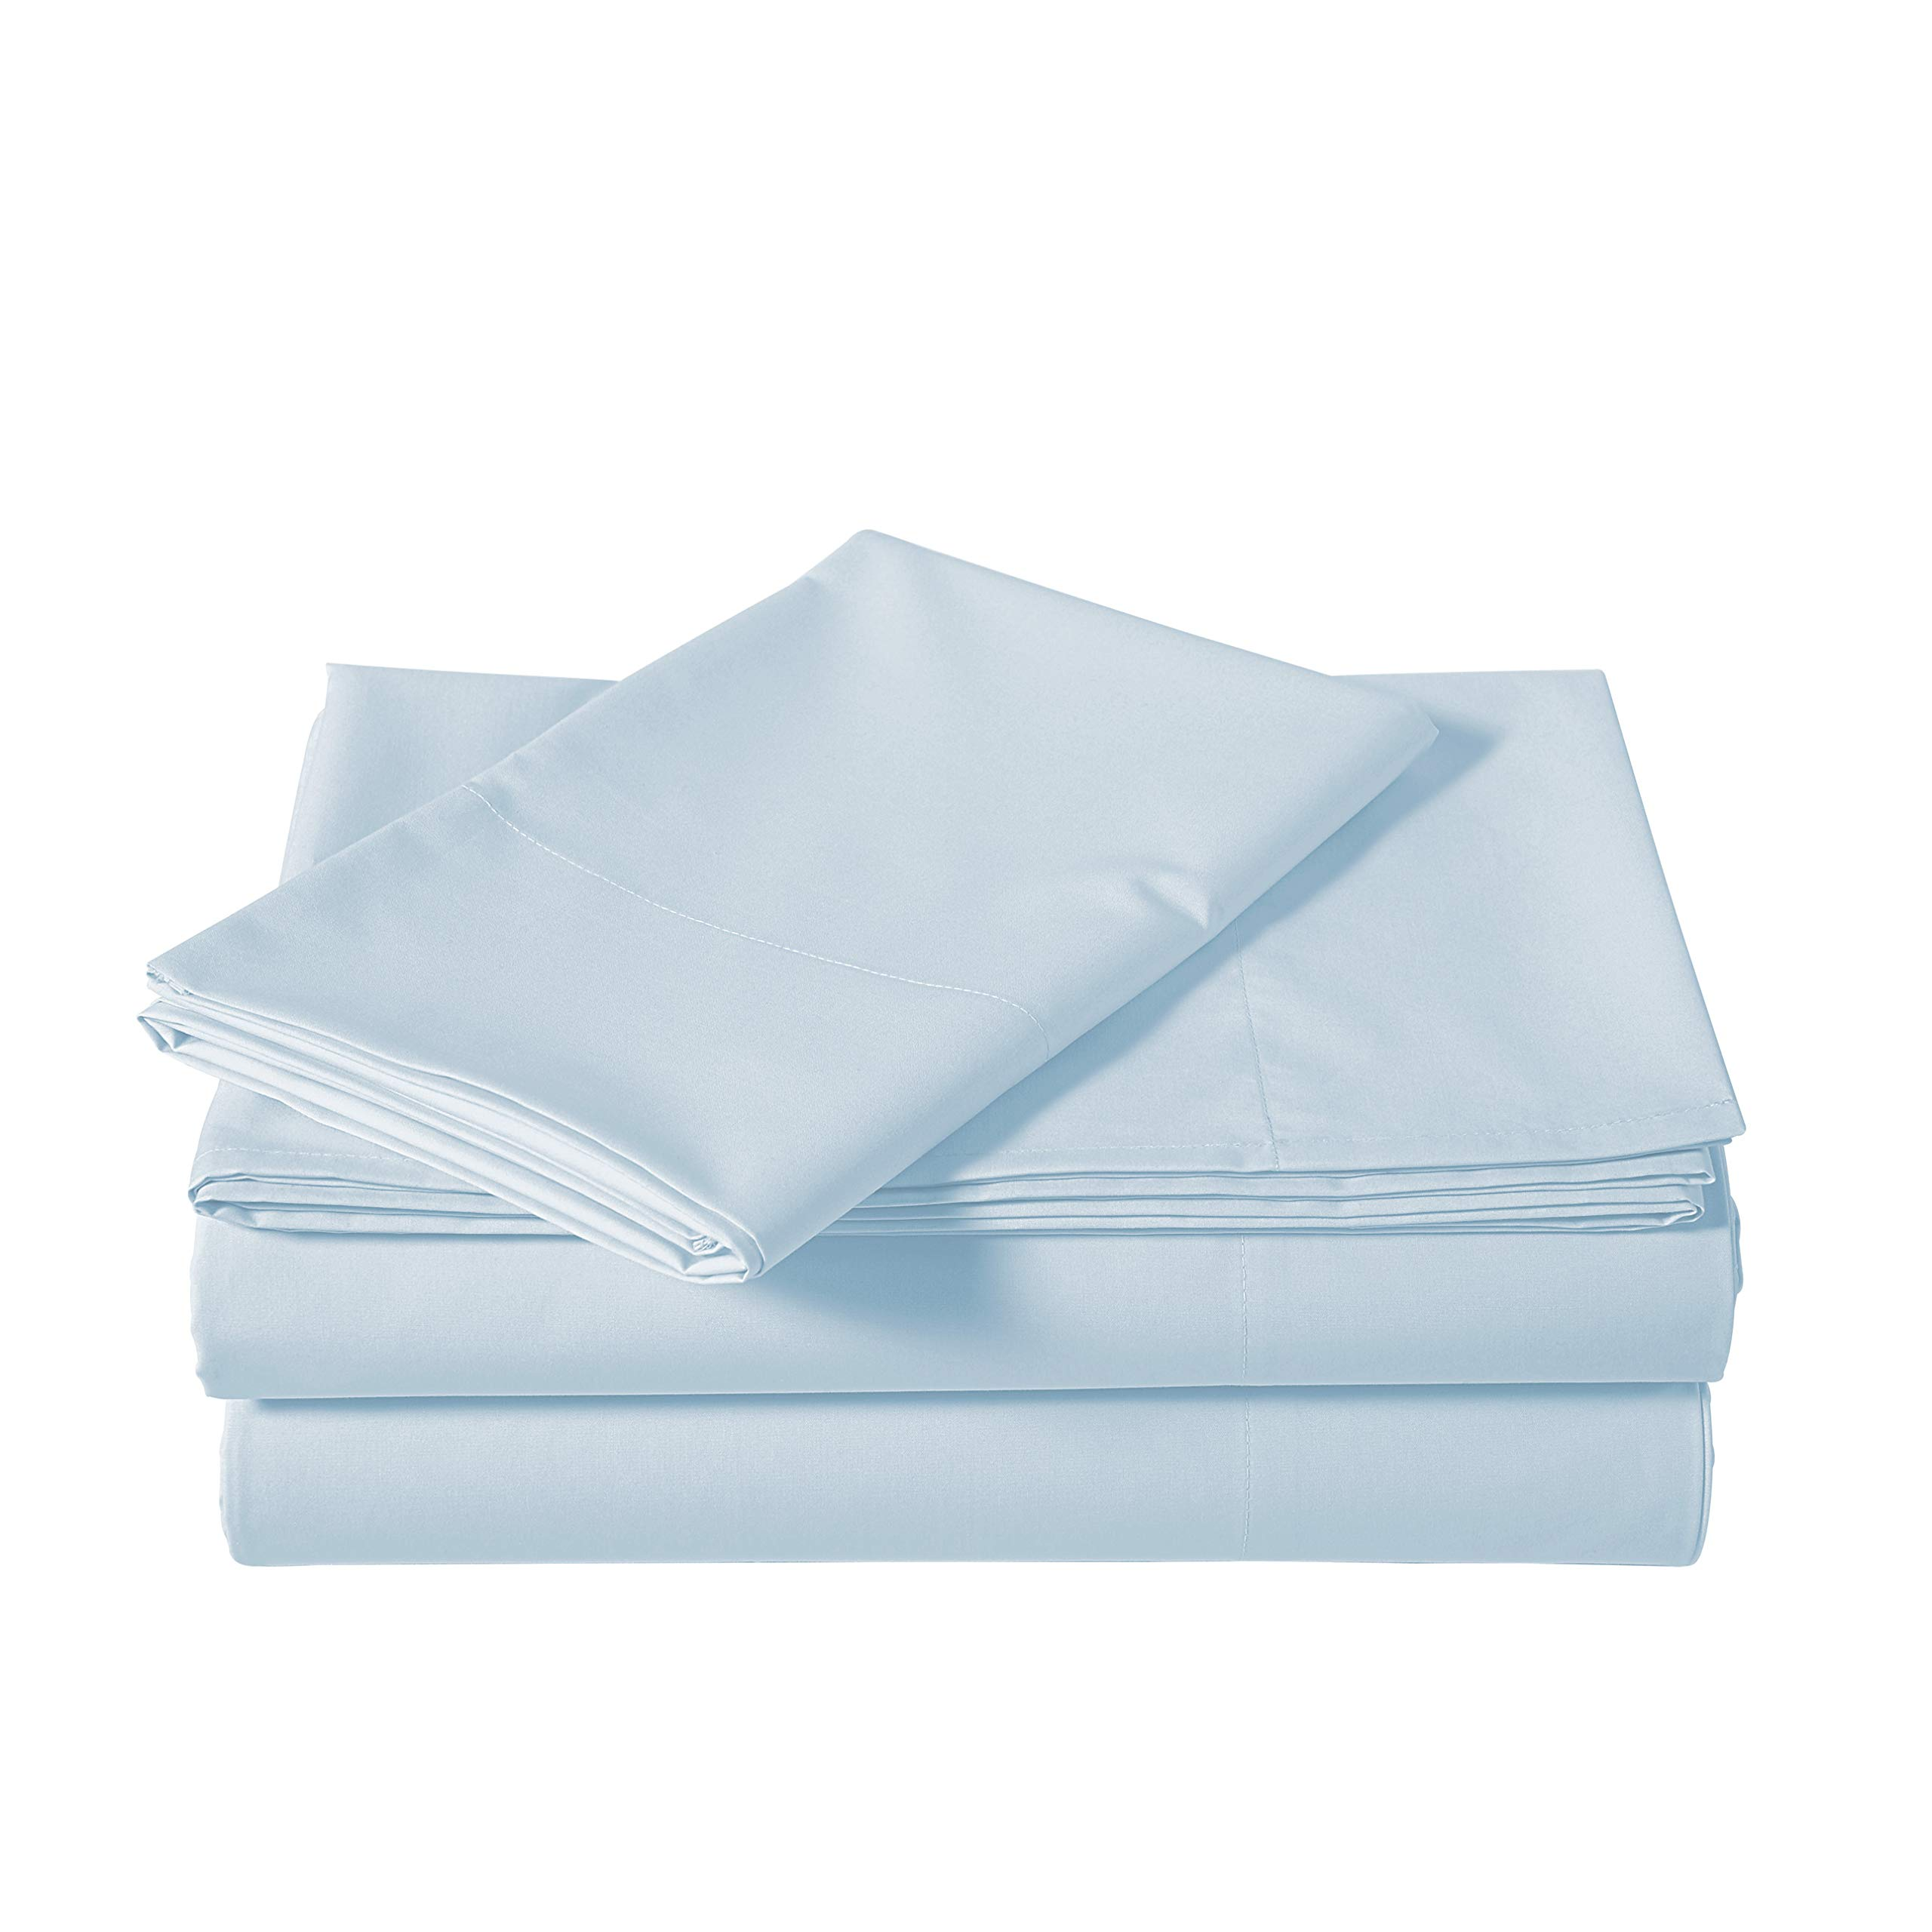 AmazonBasics Lightweight Percale Cotton Sheet Set - Twin XL, Blue Pastel